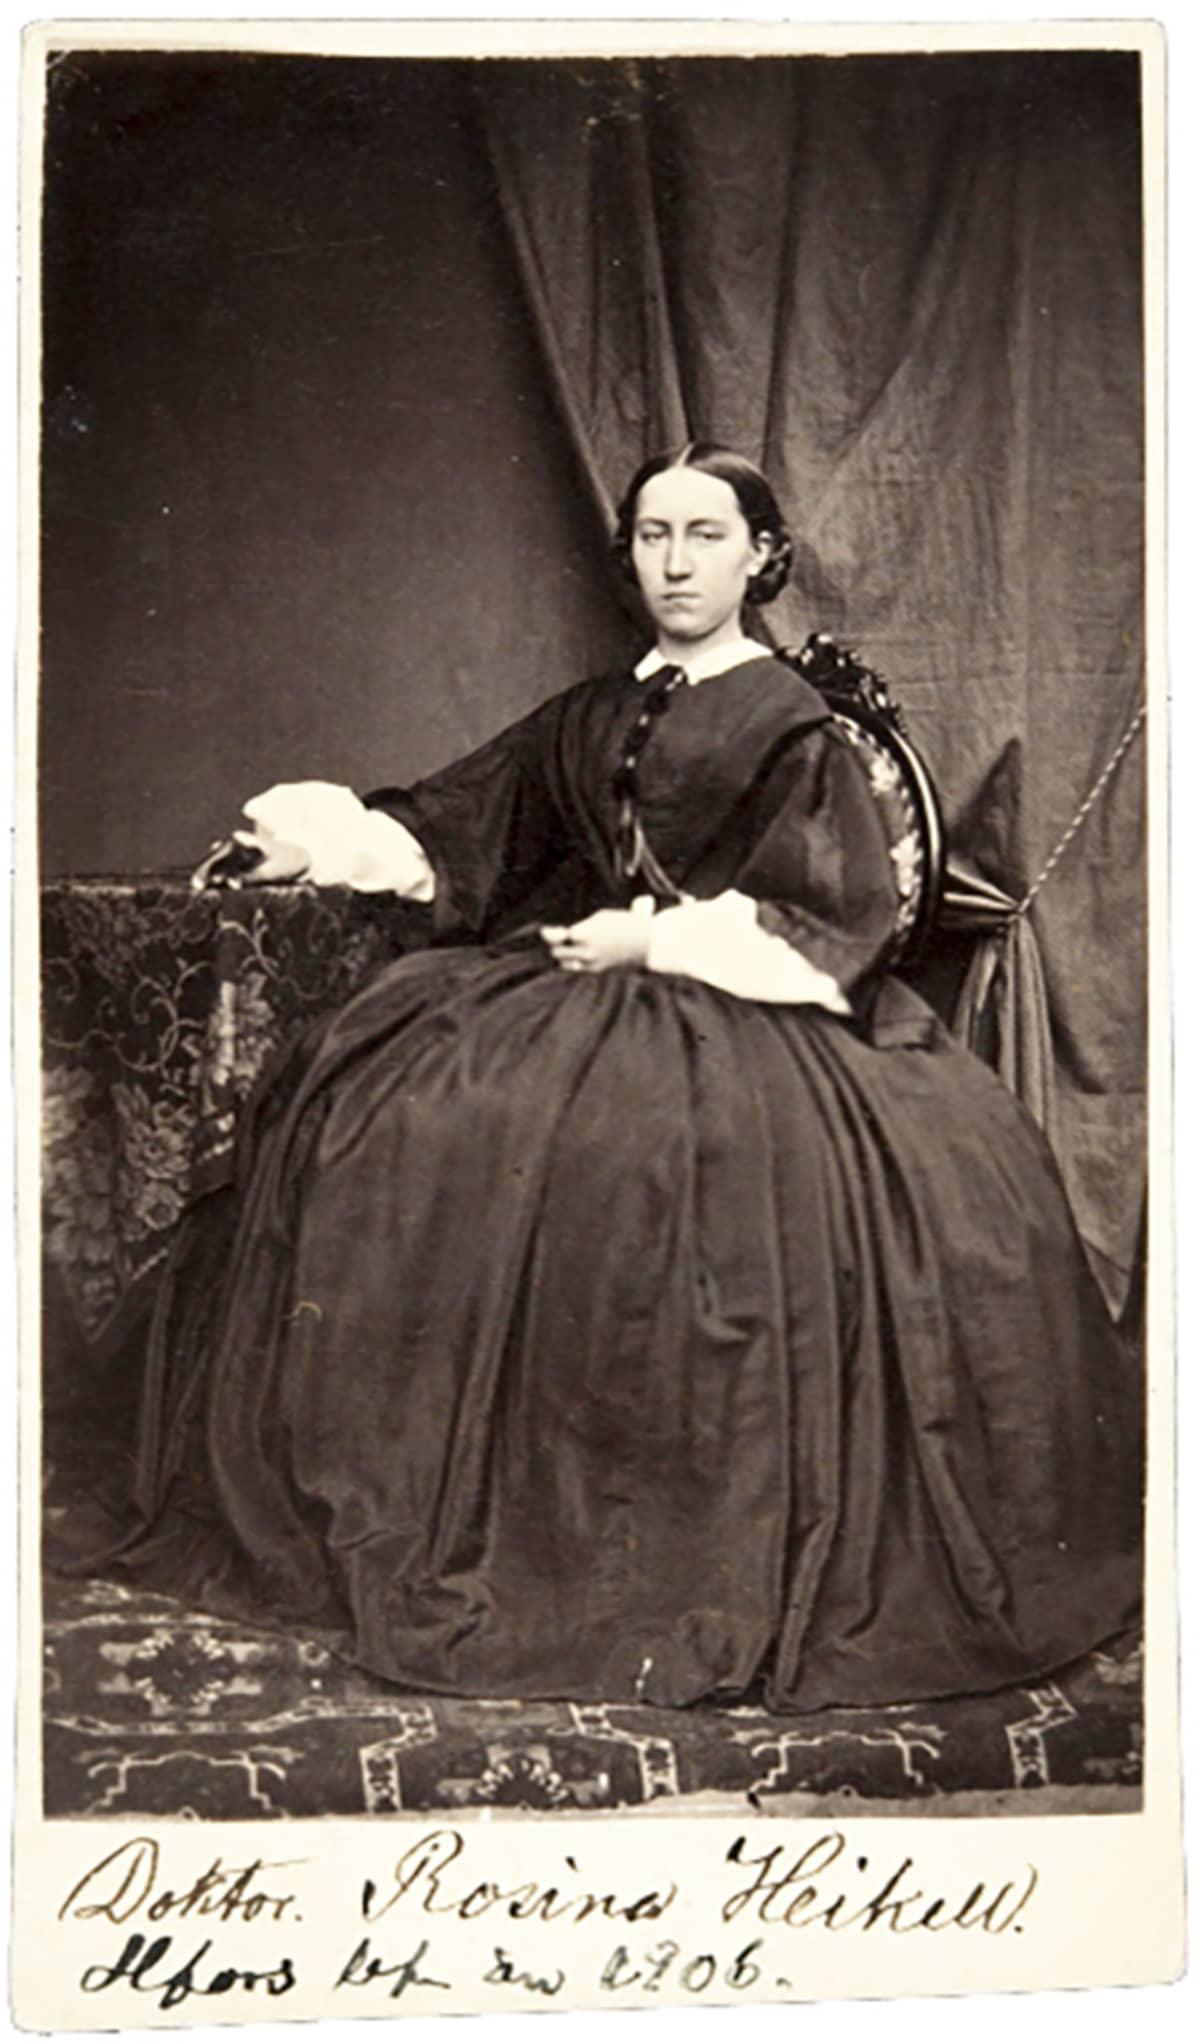 Rosina Heikell